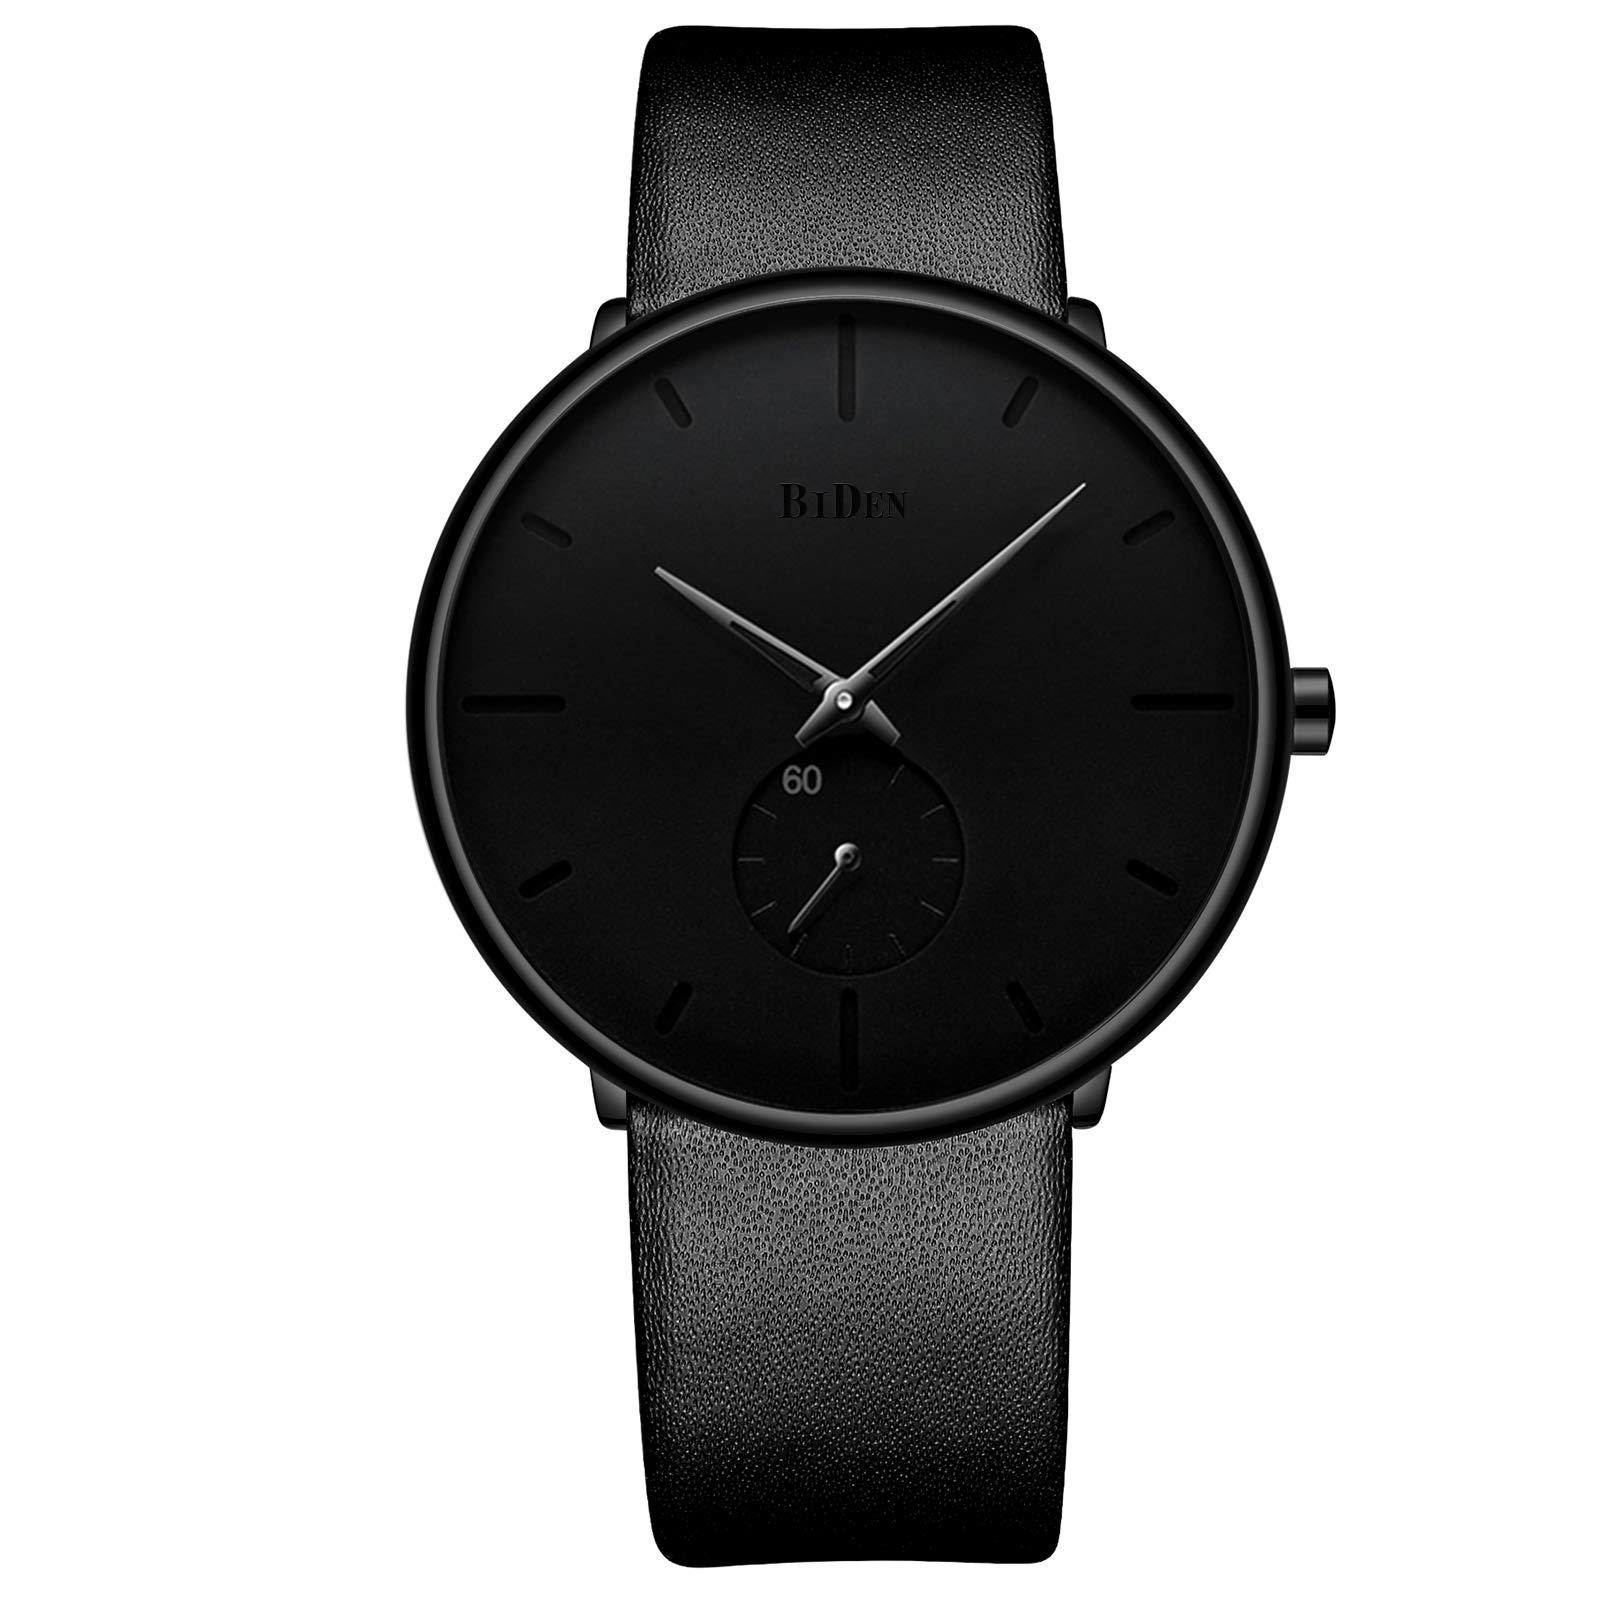 Mens Watches Minimalist Ultra Thin Waterproof Fashion Dressy Wrist Watch for Men Business Casual Luxury Quartz Analog Watch